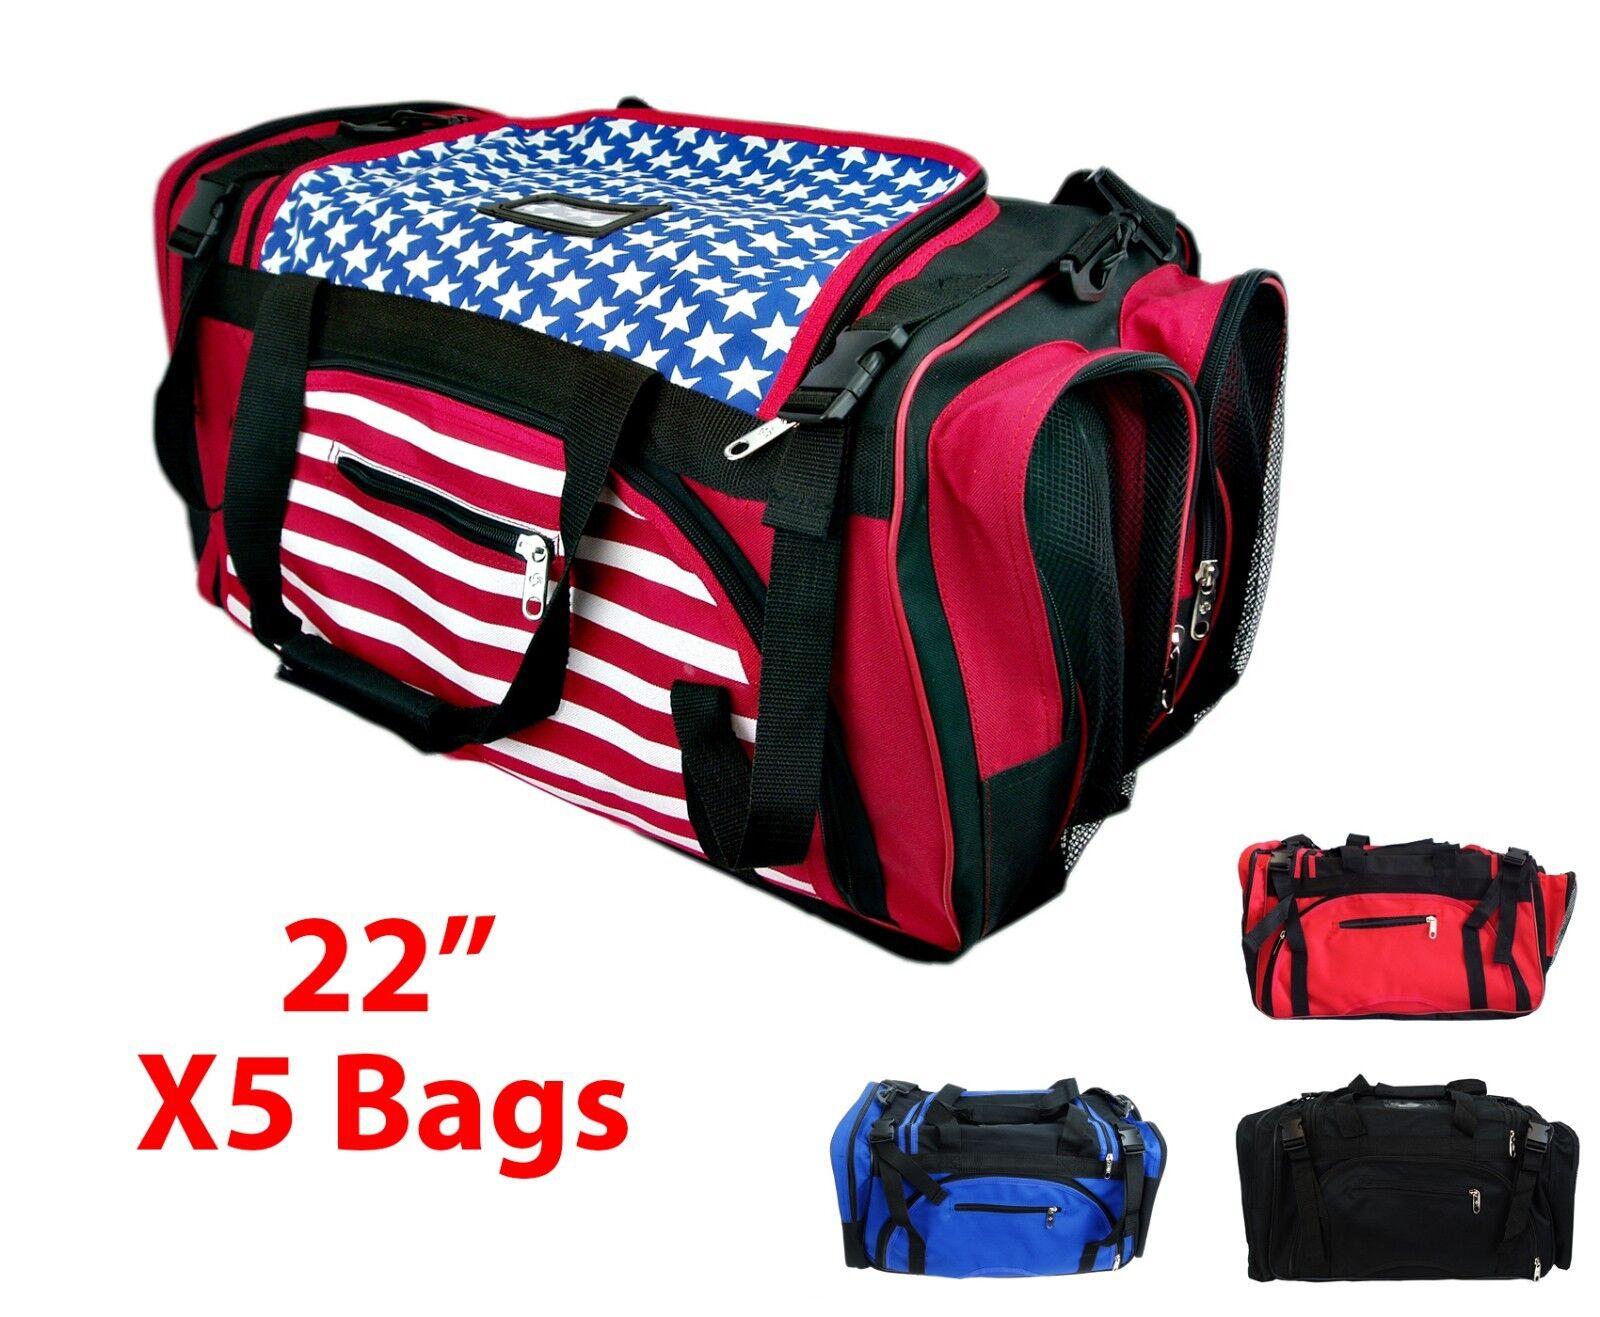 X5 EquipSiet Gear Tasche Taekwondo Karate MMA Martial Arts Travel Tasche Deluxe 22